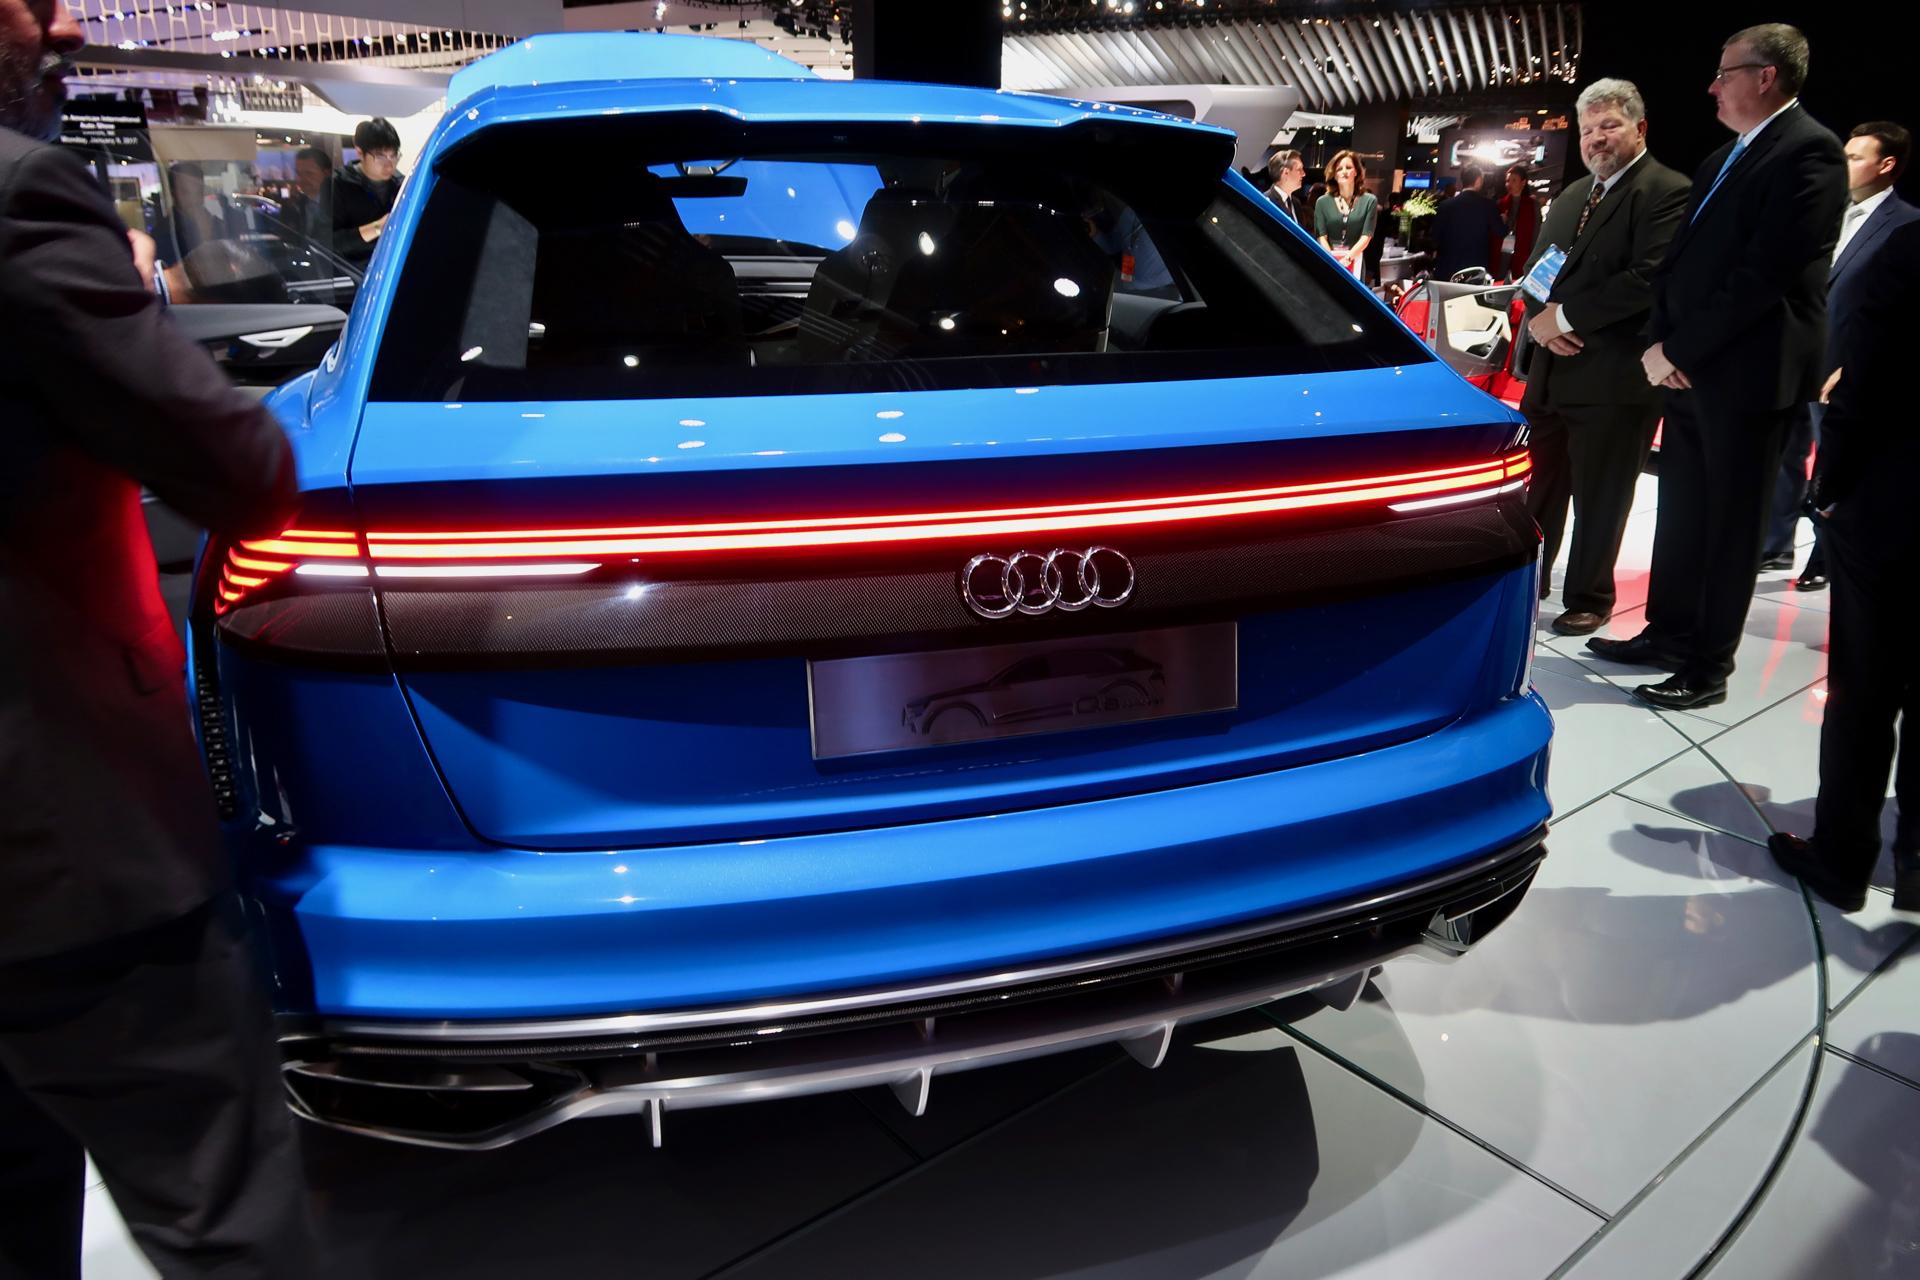 Audi Sq5 2017 Interior >> 2018 Audi Q8 Concept shows off hybrid powertrain, impressive tech